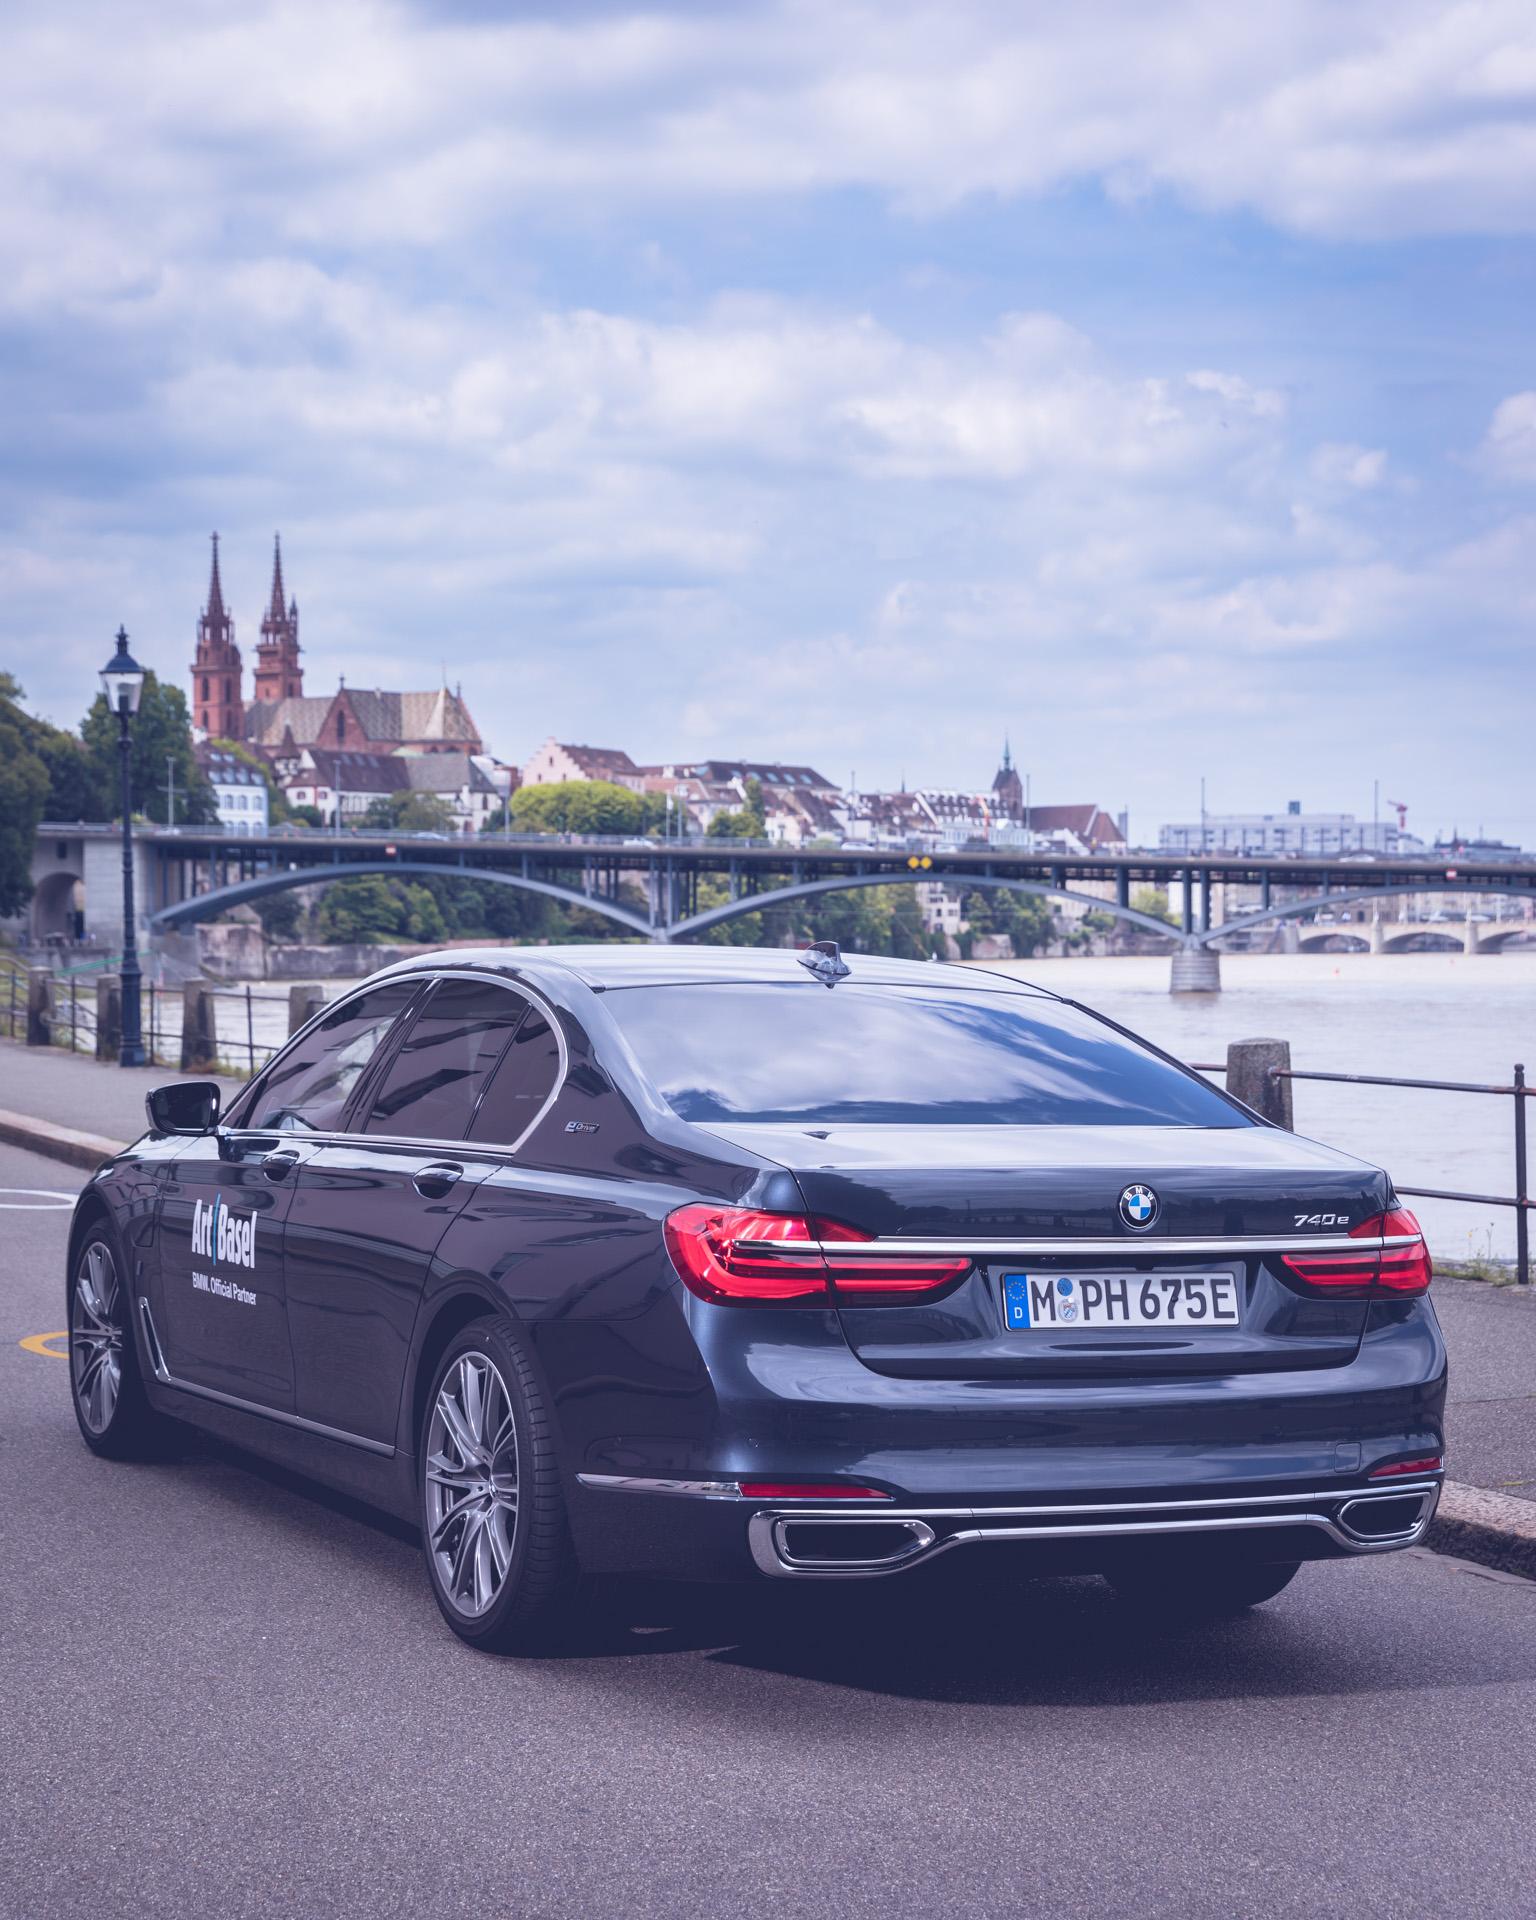 Art Basel BMW Culture 7er 7 series 2018 vor Mittlere Brücke Rhein in Basel Urban Heck Dom